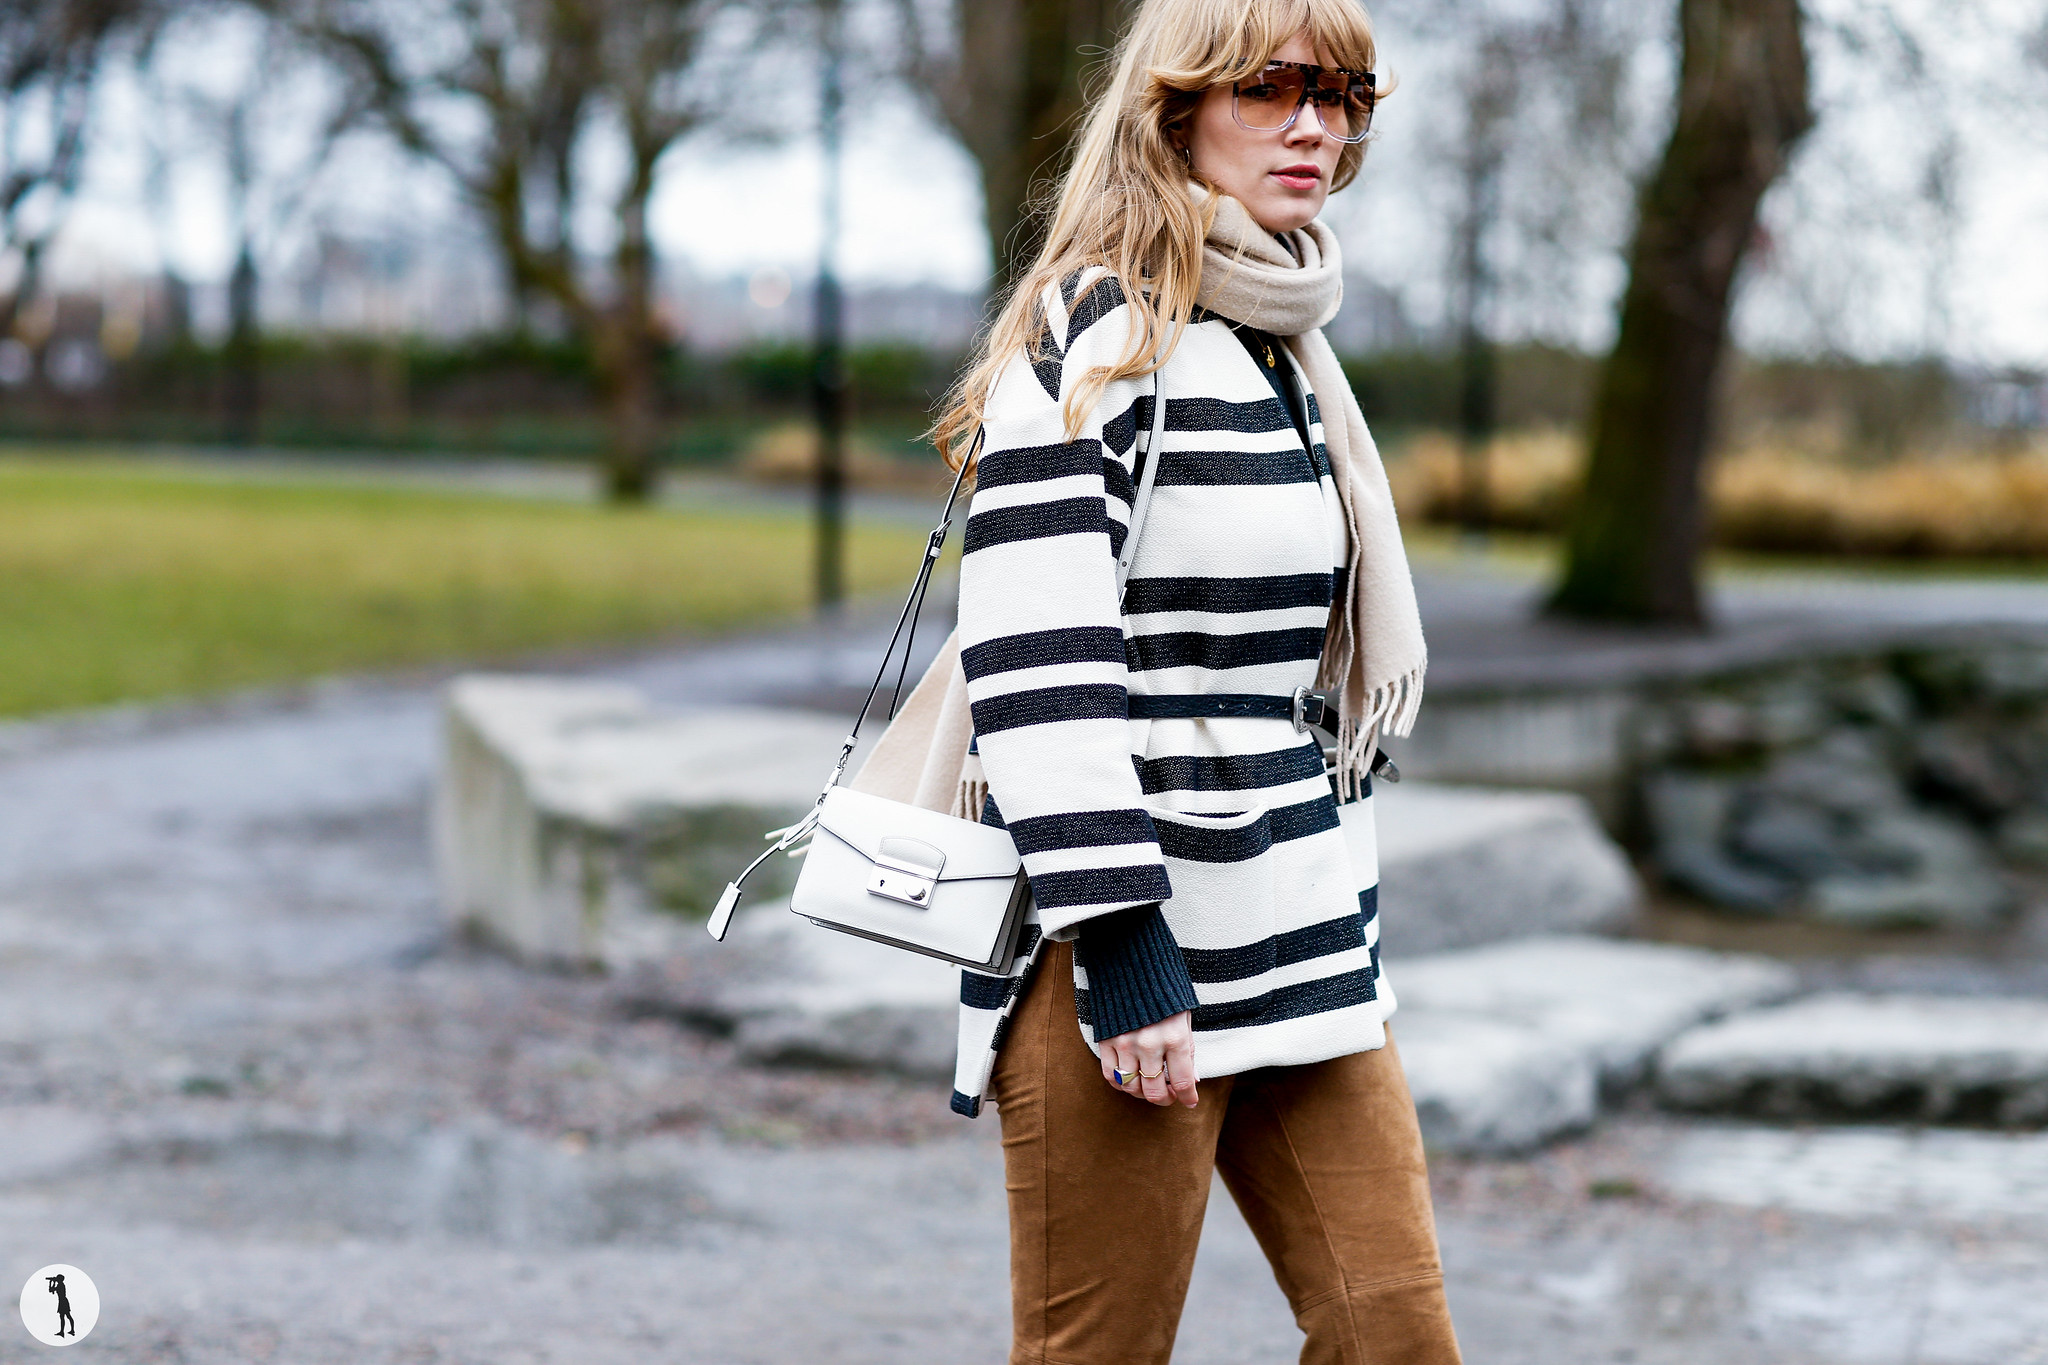 Fiona Jane - Stockholm Fashion Week FW16-17 (7)